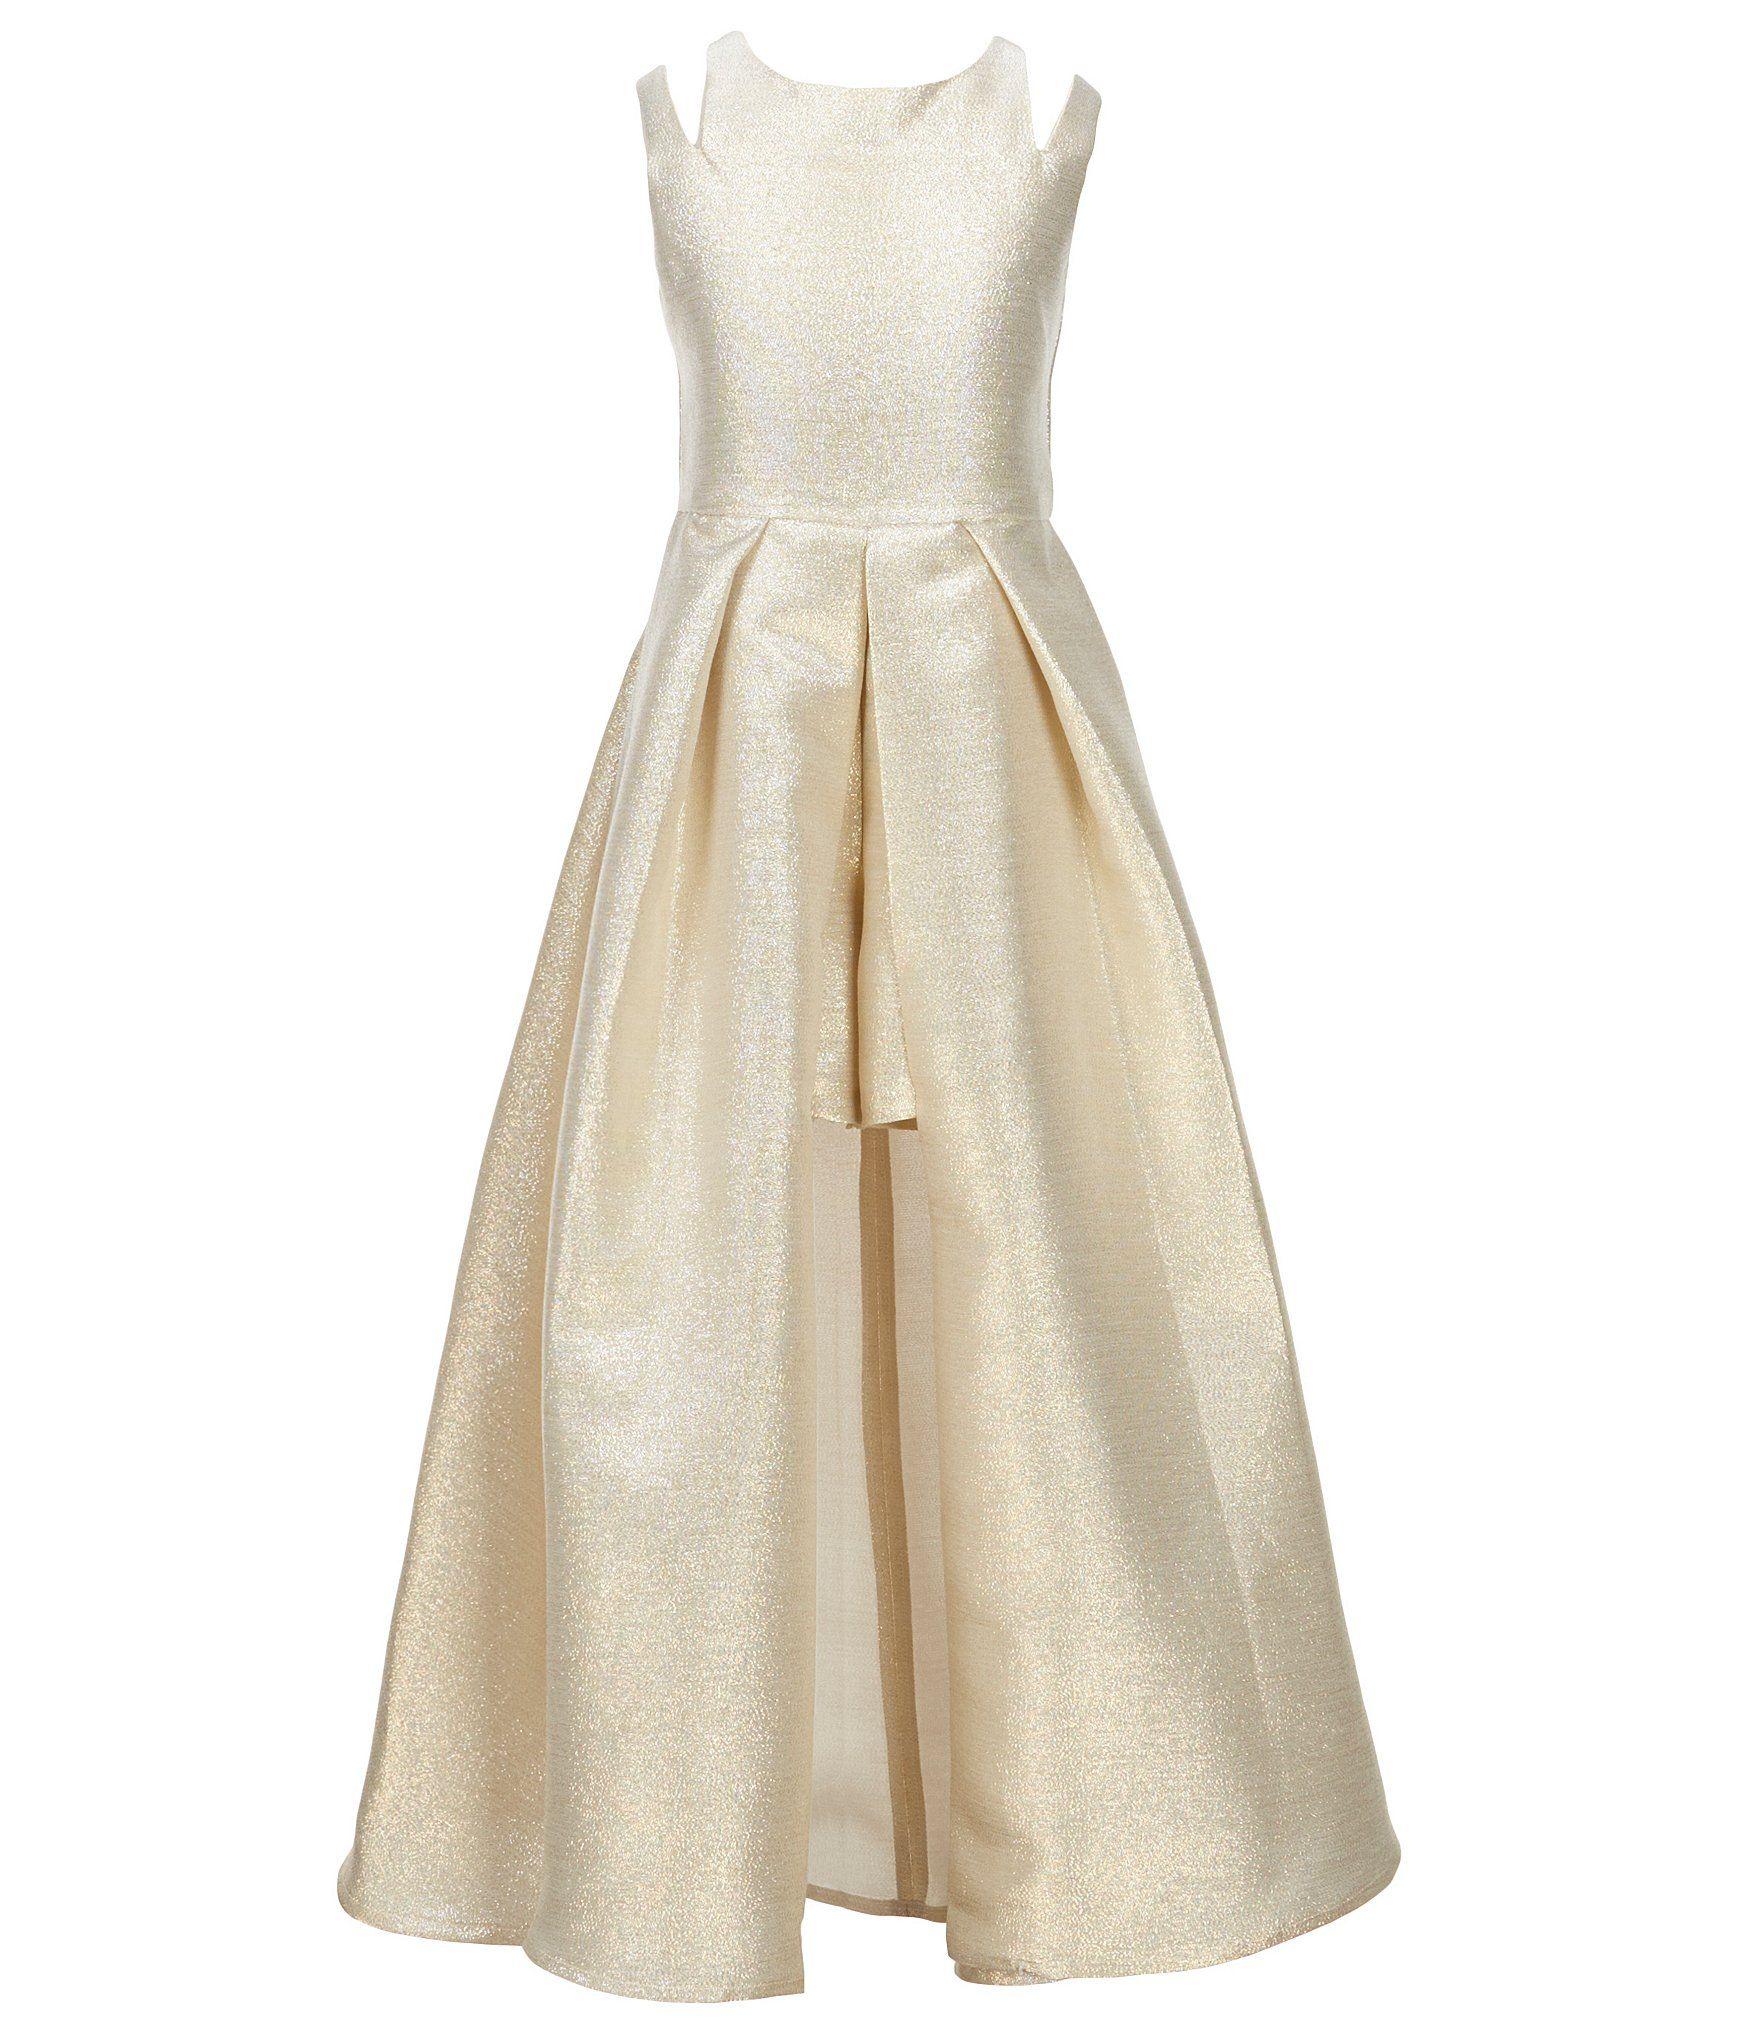 ade86ec0a00 Junior Bridesmaid Dresses At Dillards - Data Dynamic AG